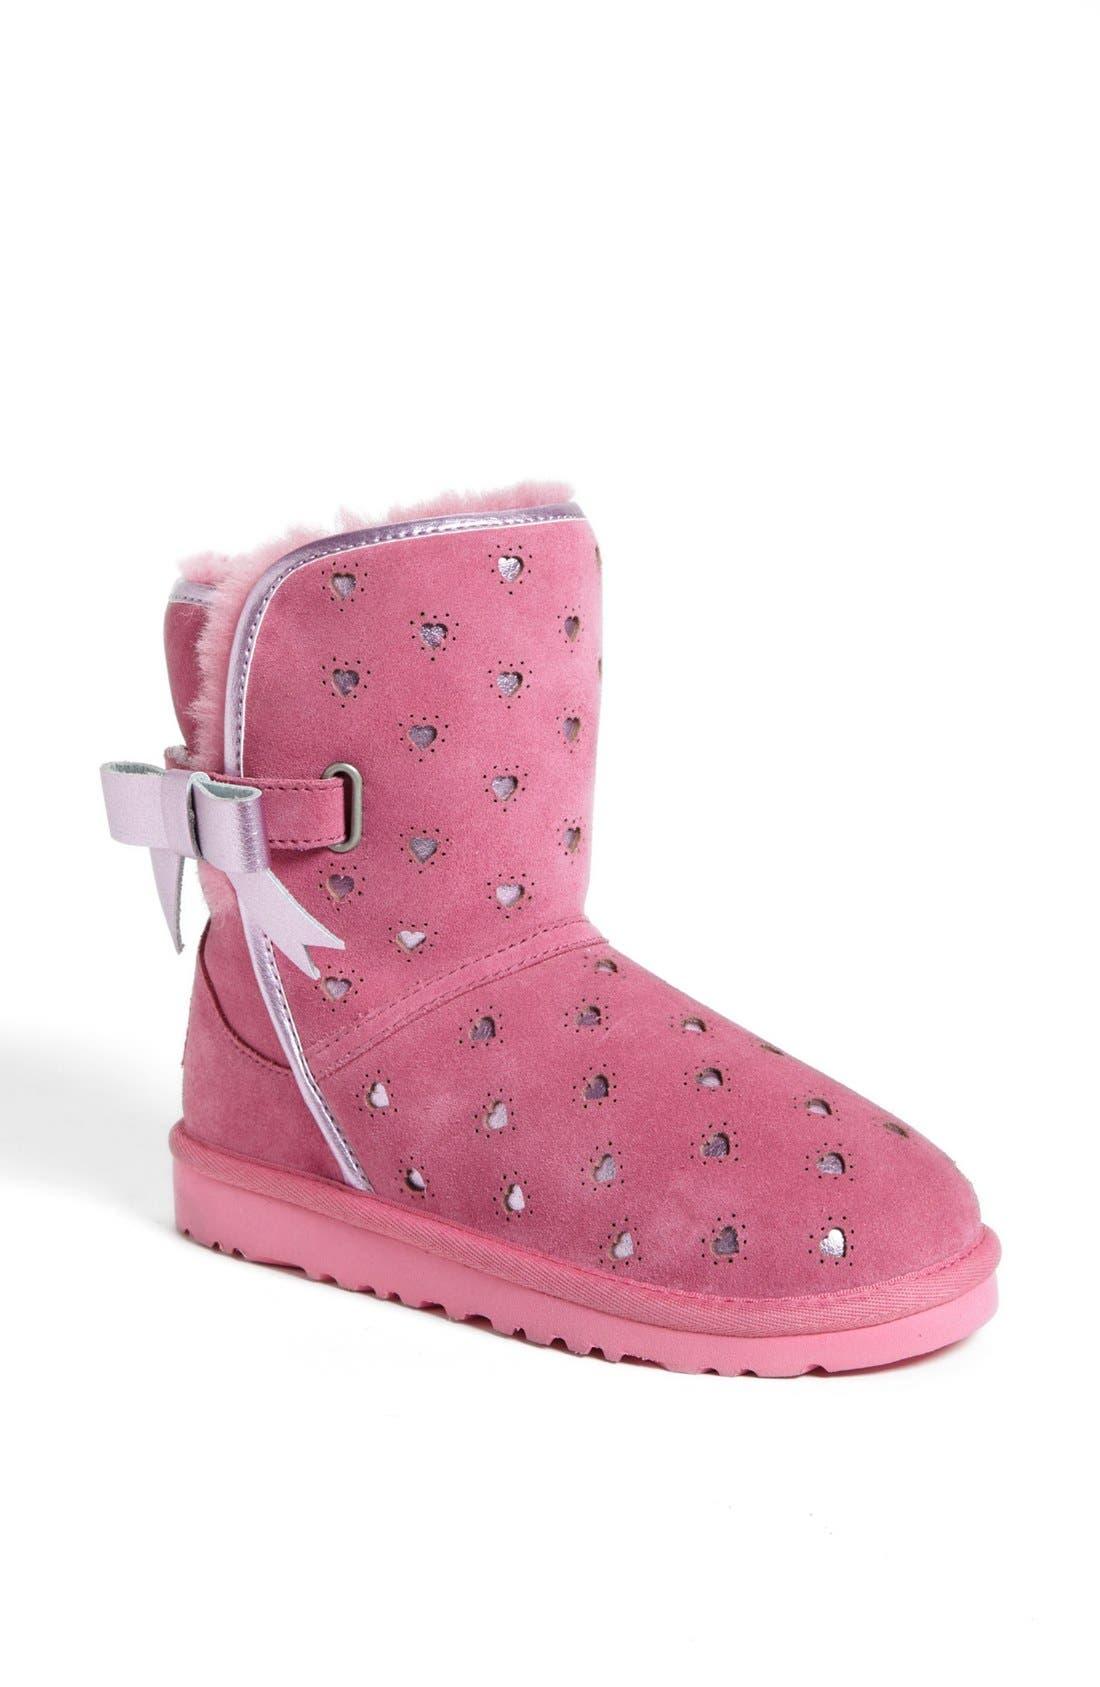 Main Image - UGG® Australia 'Joleigh Glitter' Boot (Toddler, Little Kid & Big Kid) (Nordstrom Exclusive)